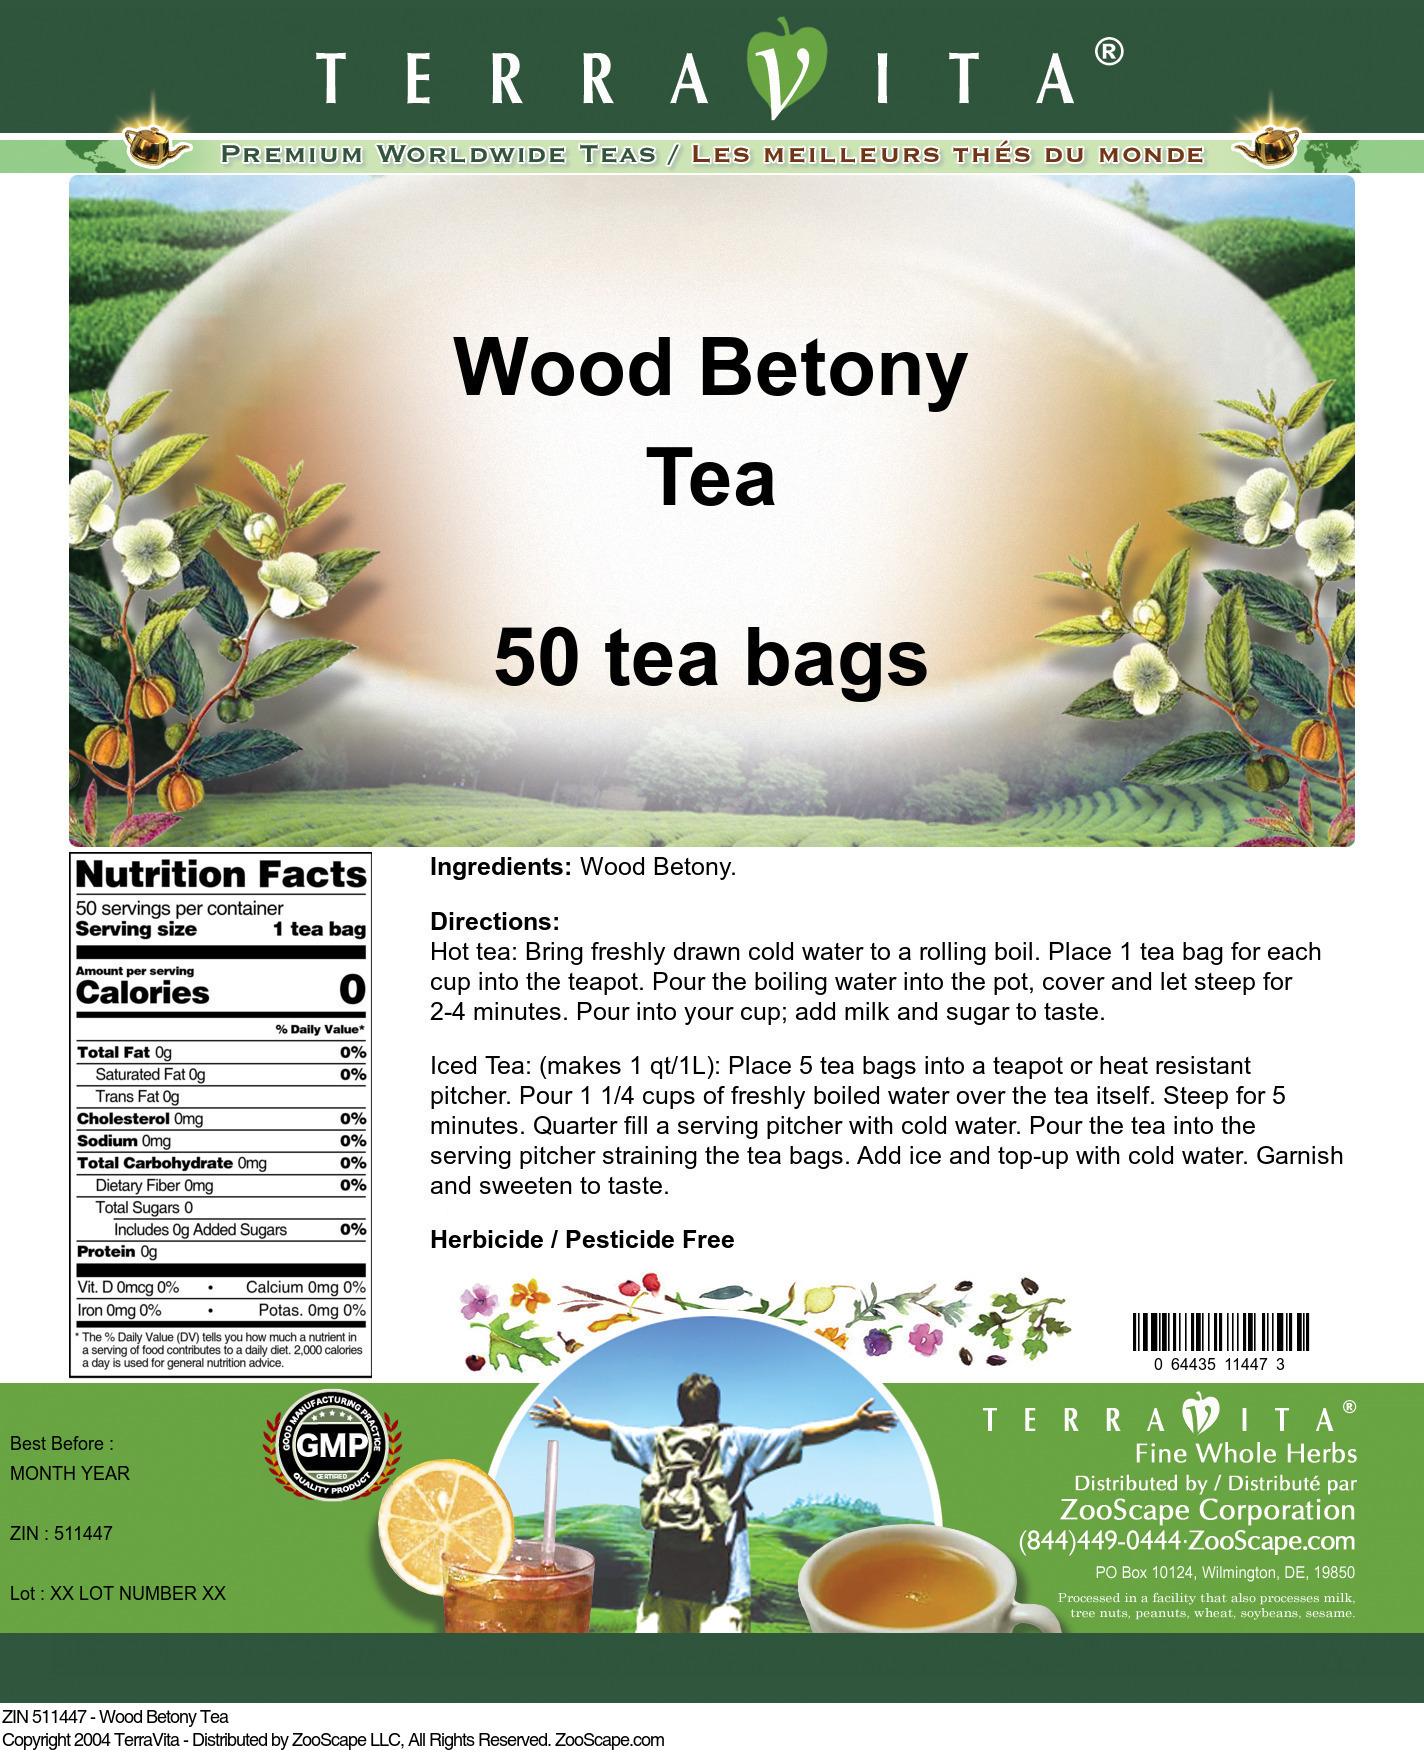 Wood Betony Tea